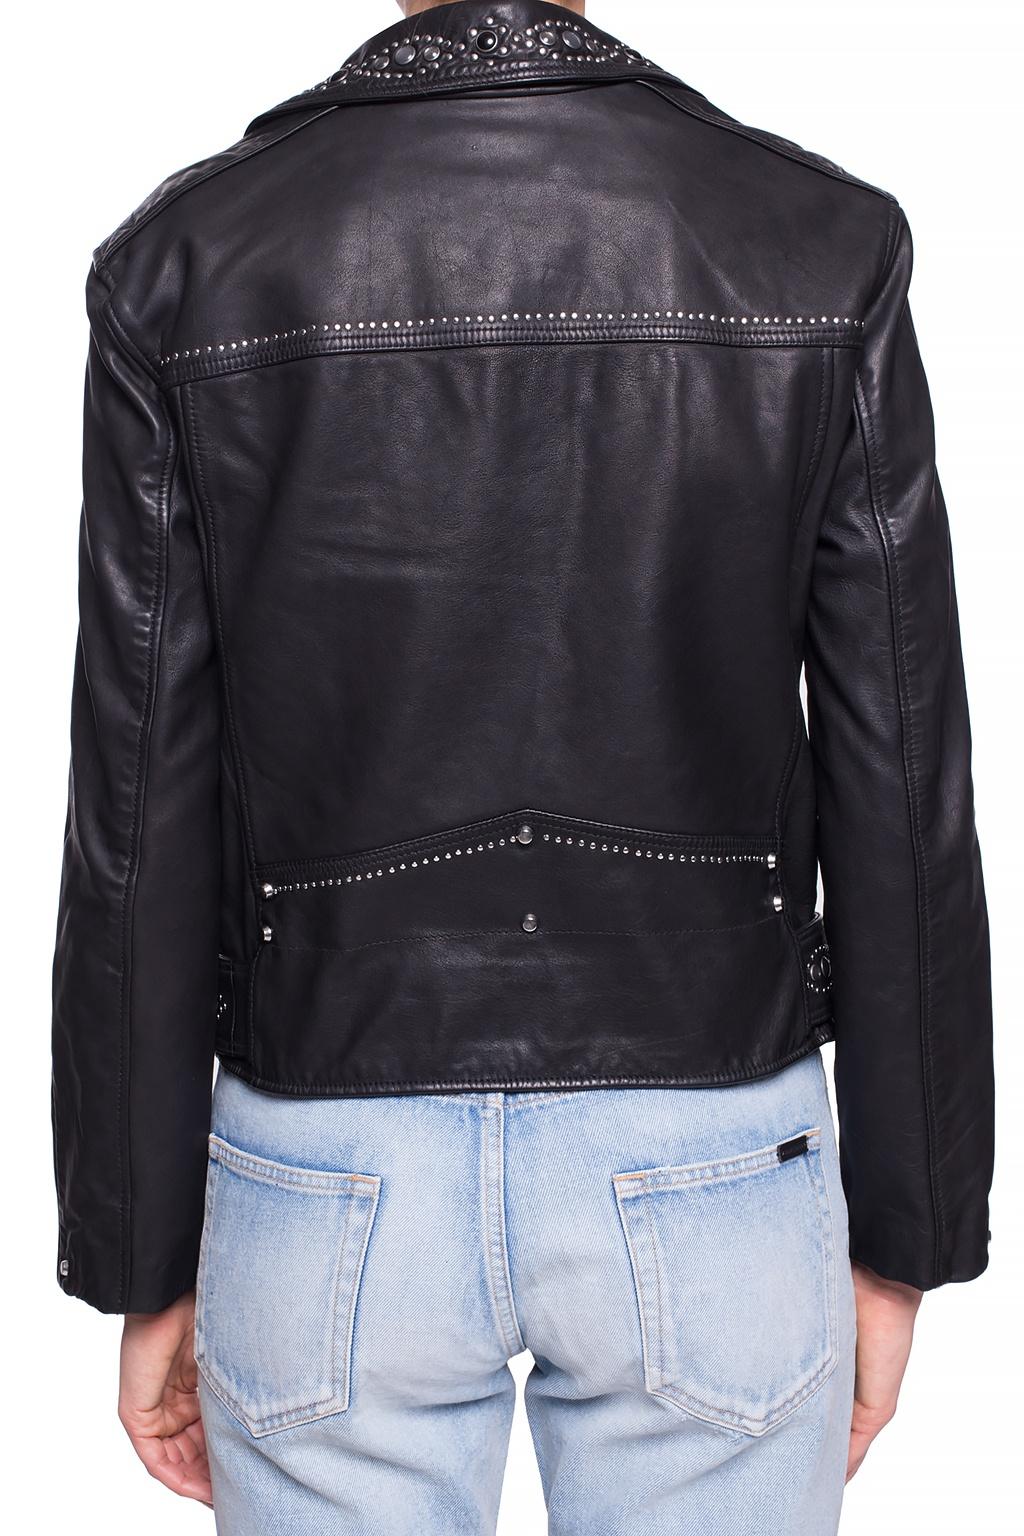 AllSaints 'Luna' leather jacket